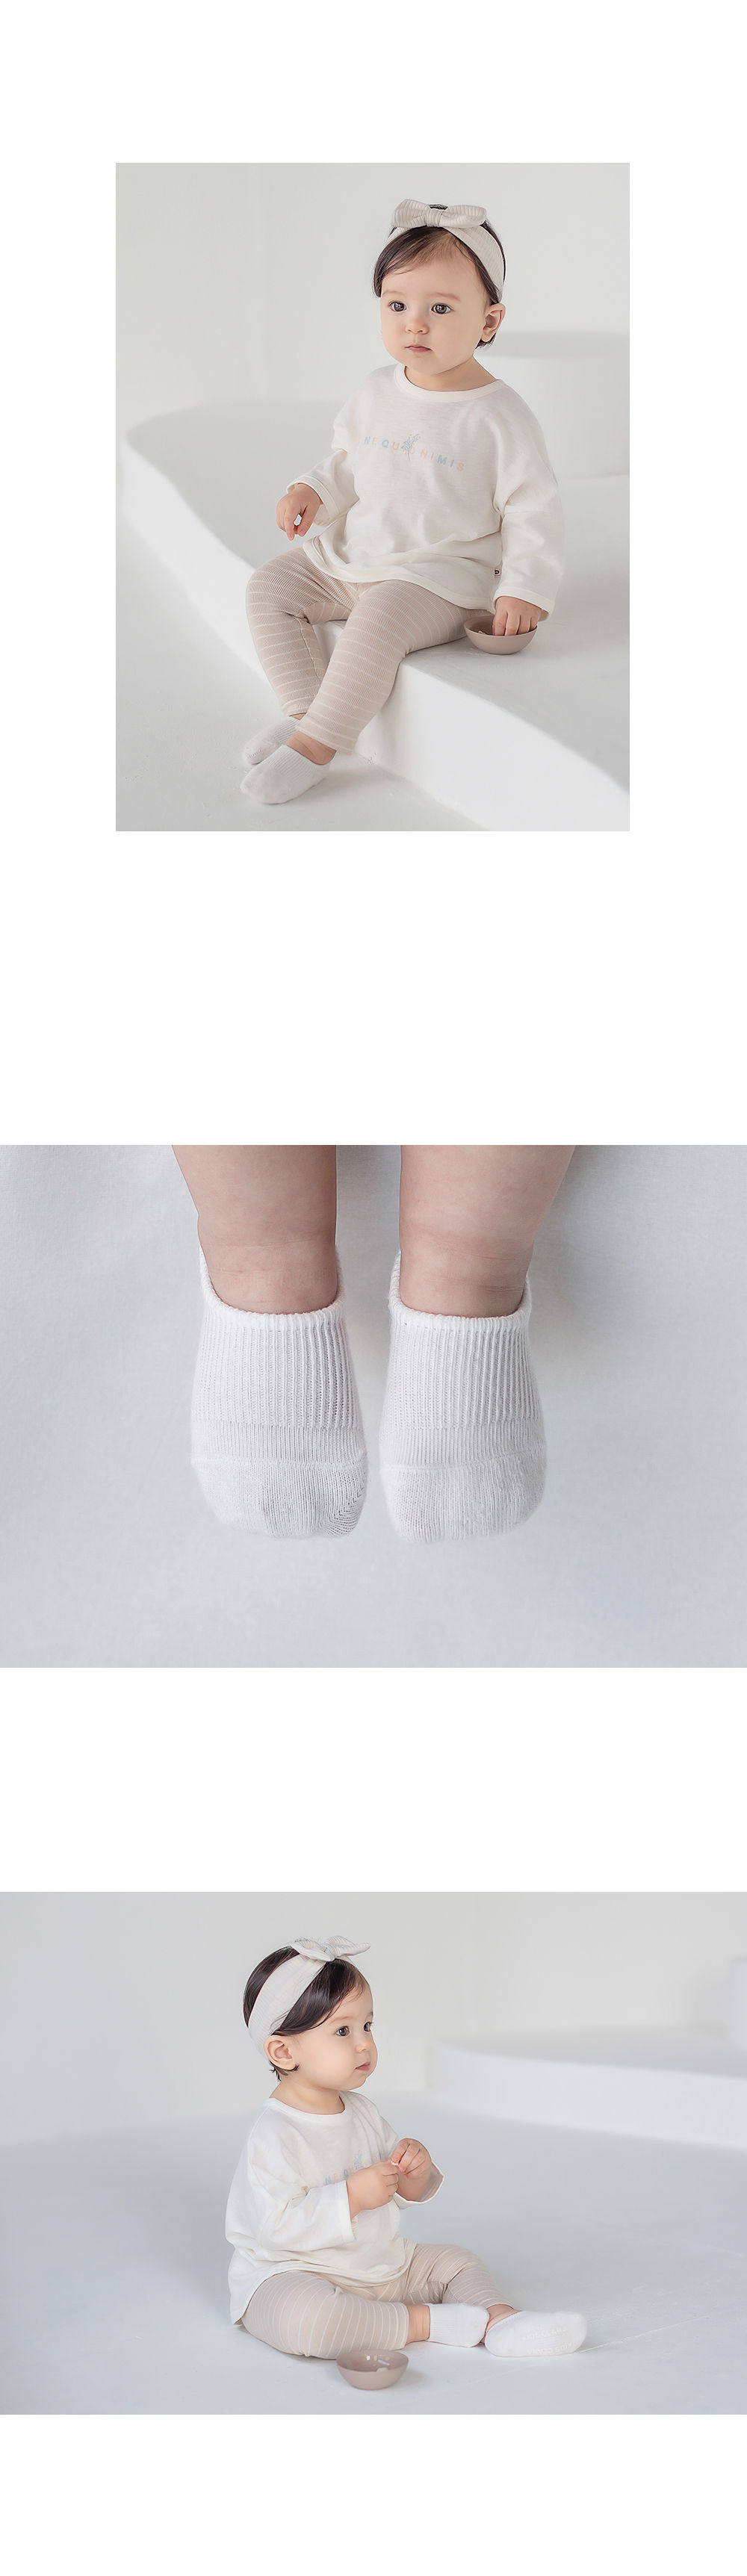 KIDS CLARA - Korean Children Fashion - #Kfashion4kids - Nest Baby Boat Socks 2-in-1 [set of 5] - 8